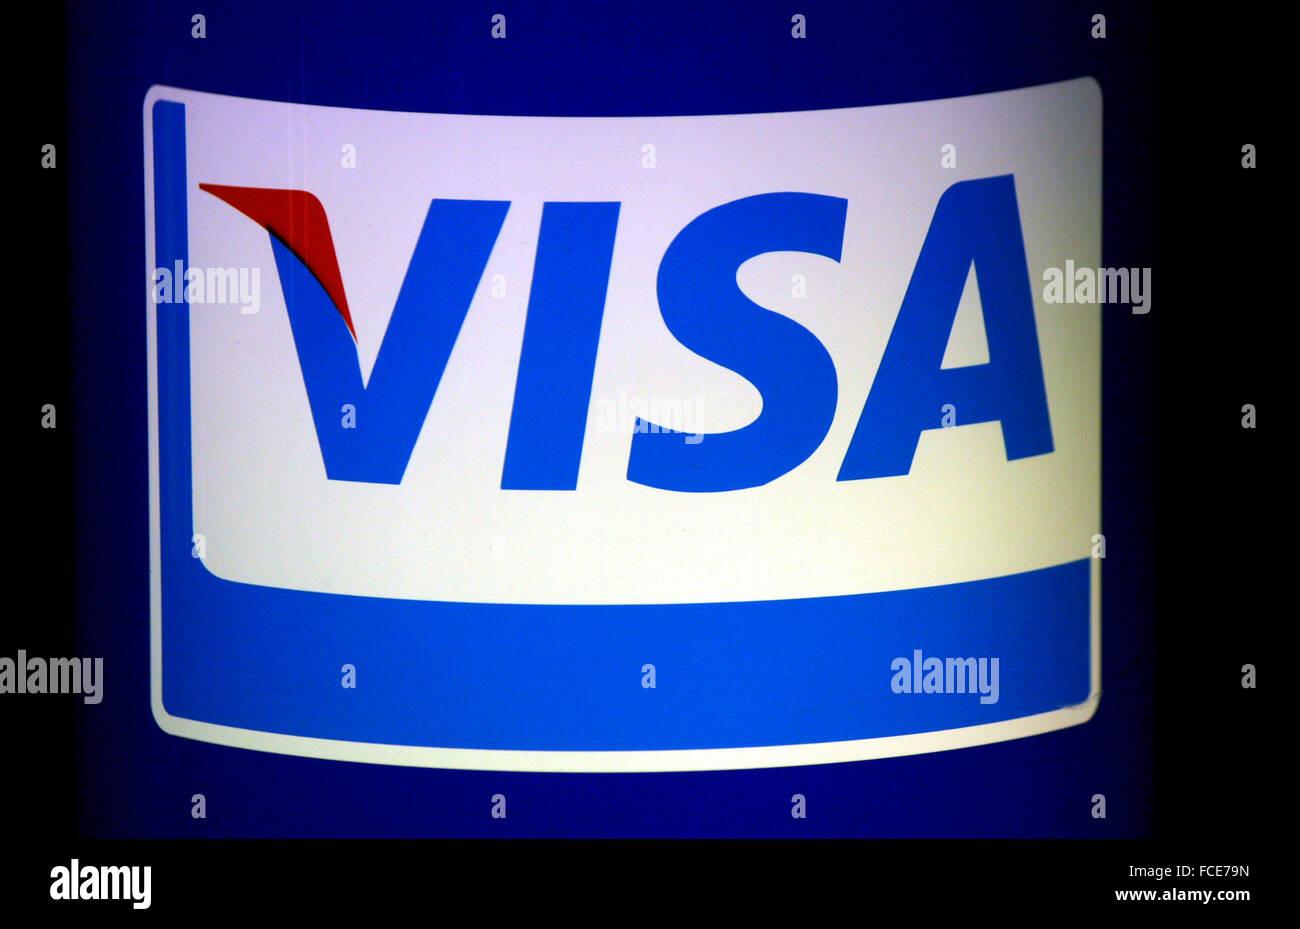 Markenname: 'Visa', Berlin. - Stock Image